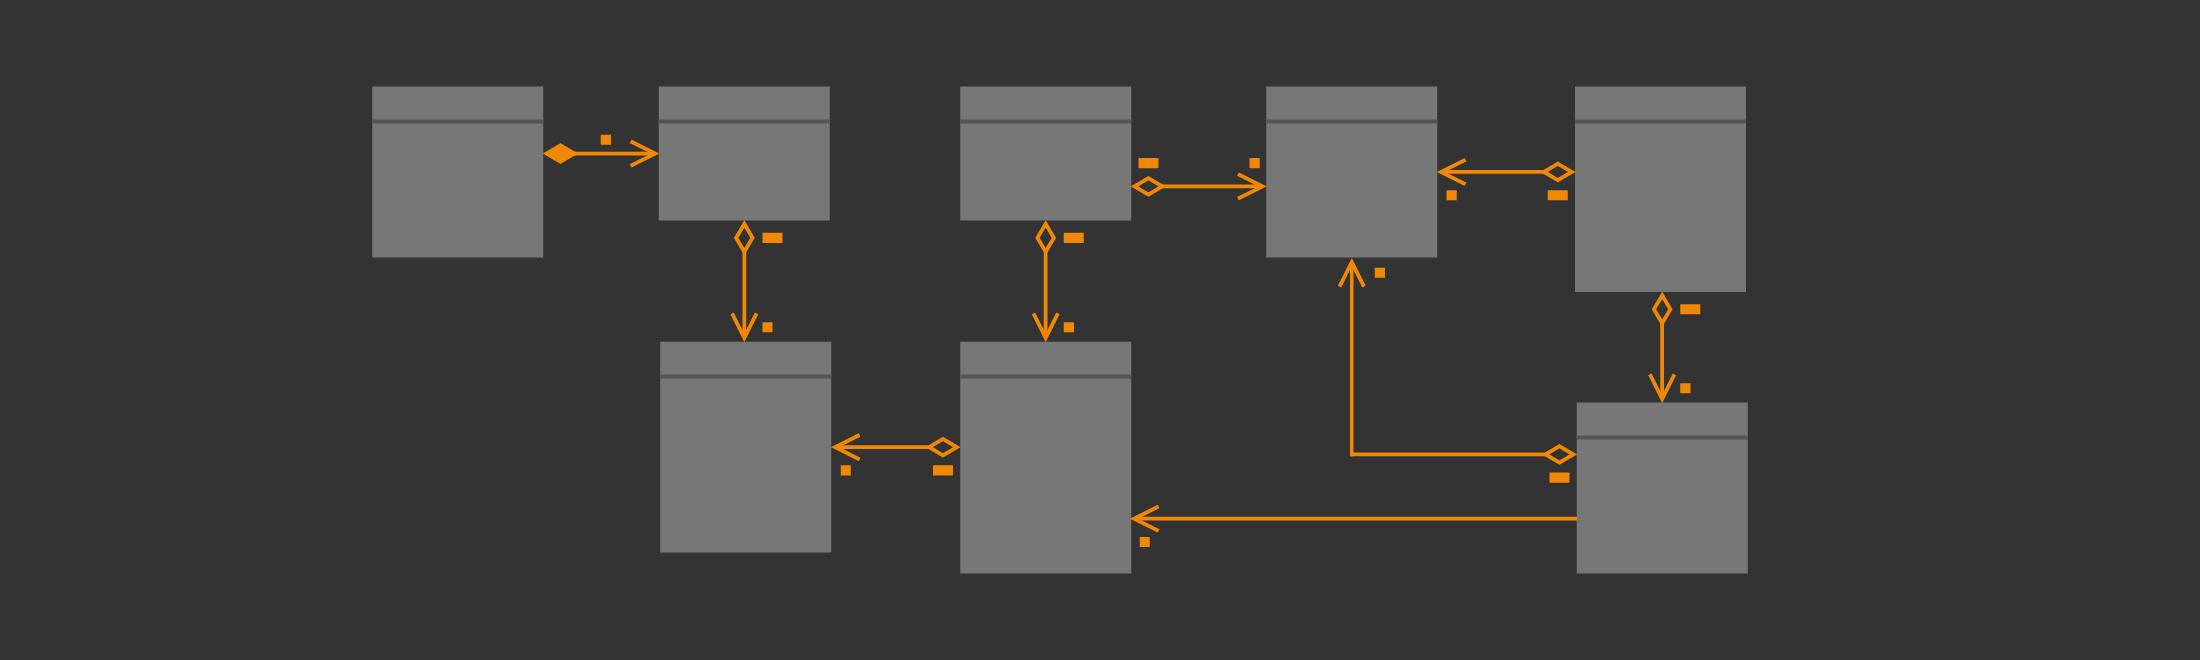 draw.io diagrams for Software development processes